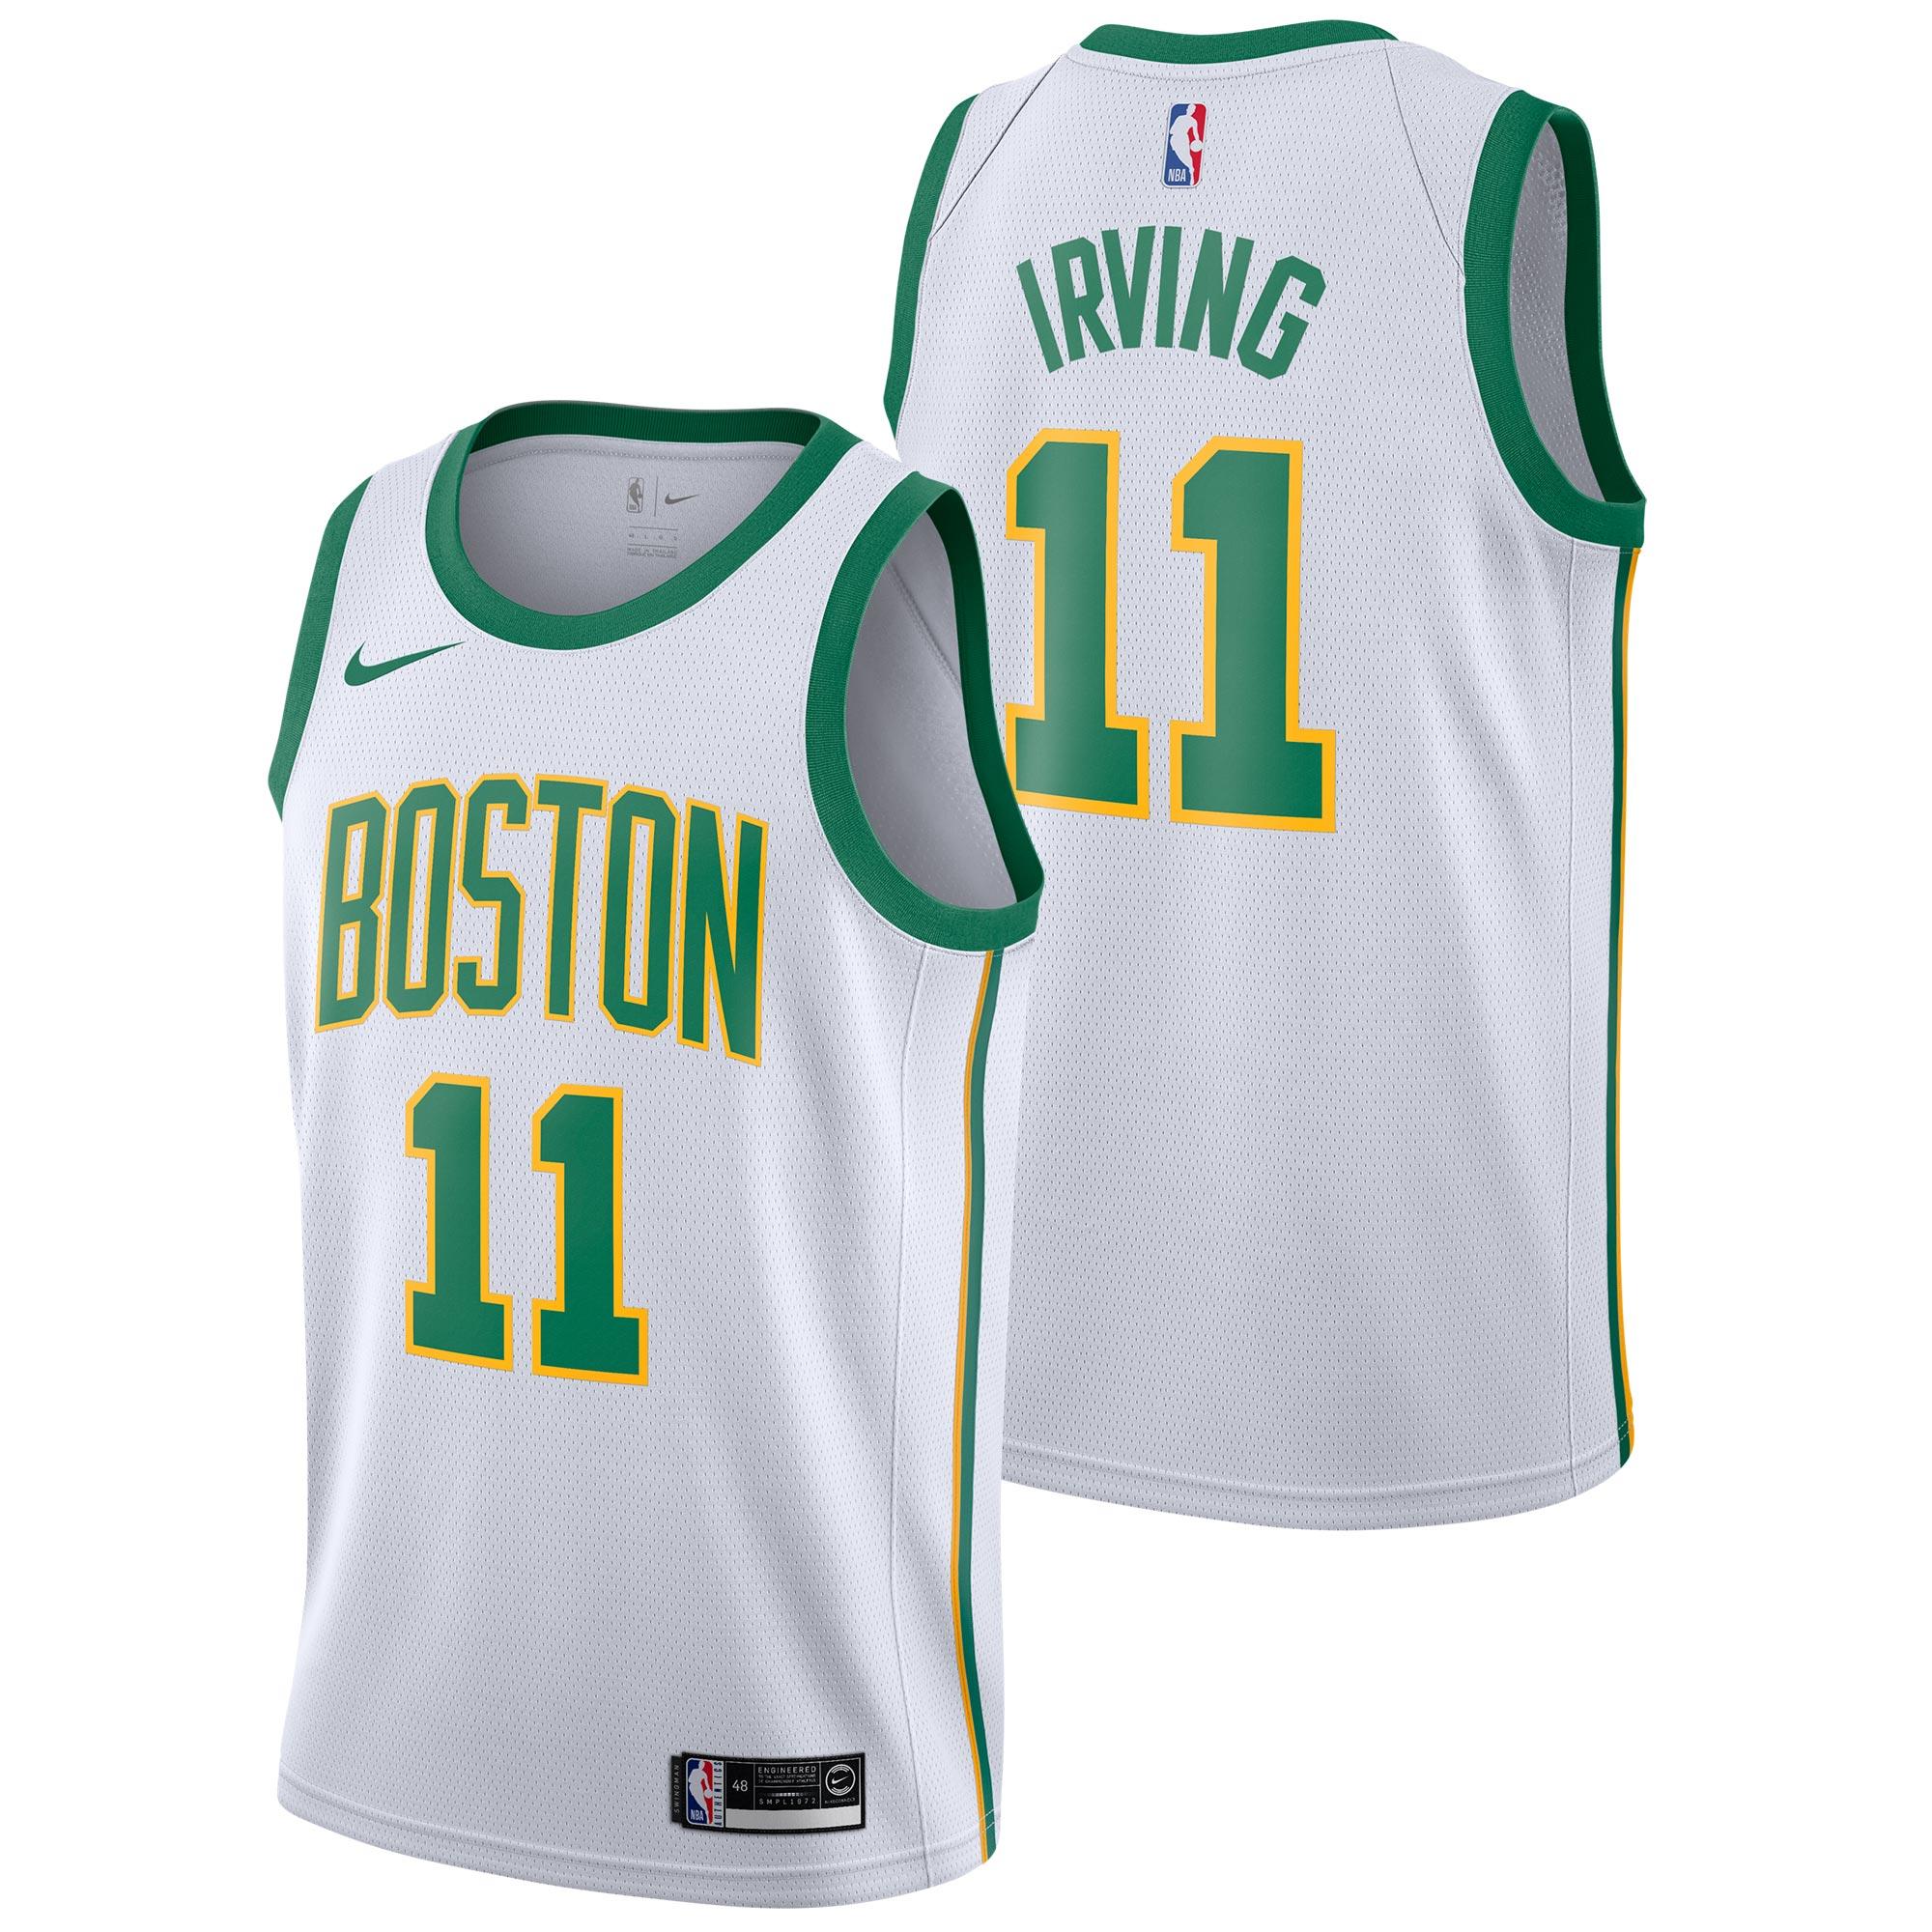 """Boston Celtics Nike City Edition Swingman Jersey - Kyrie Irving - Mens"""